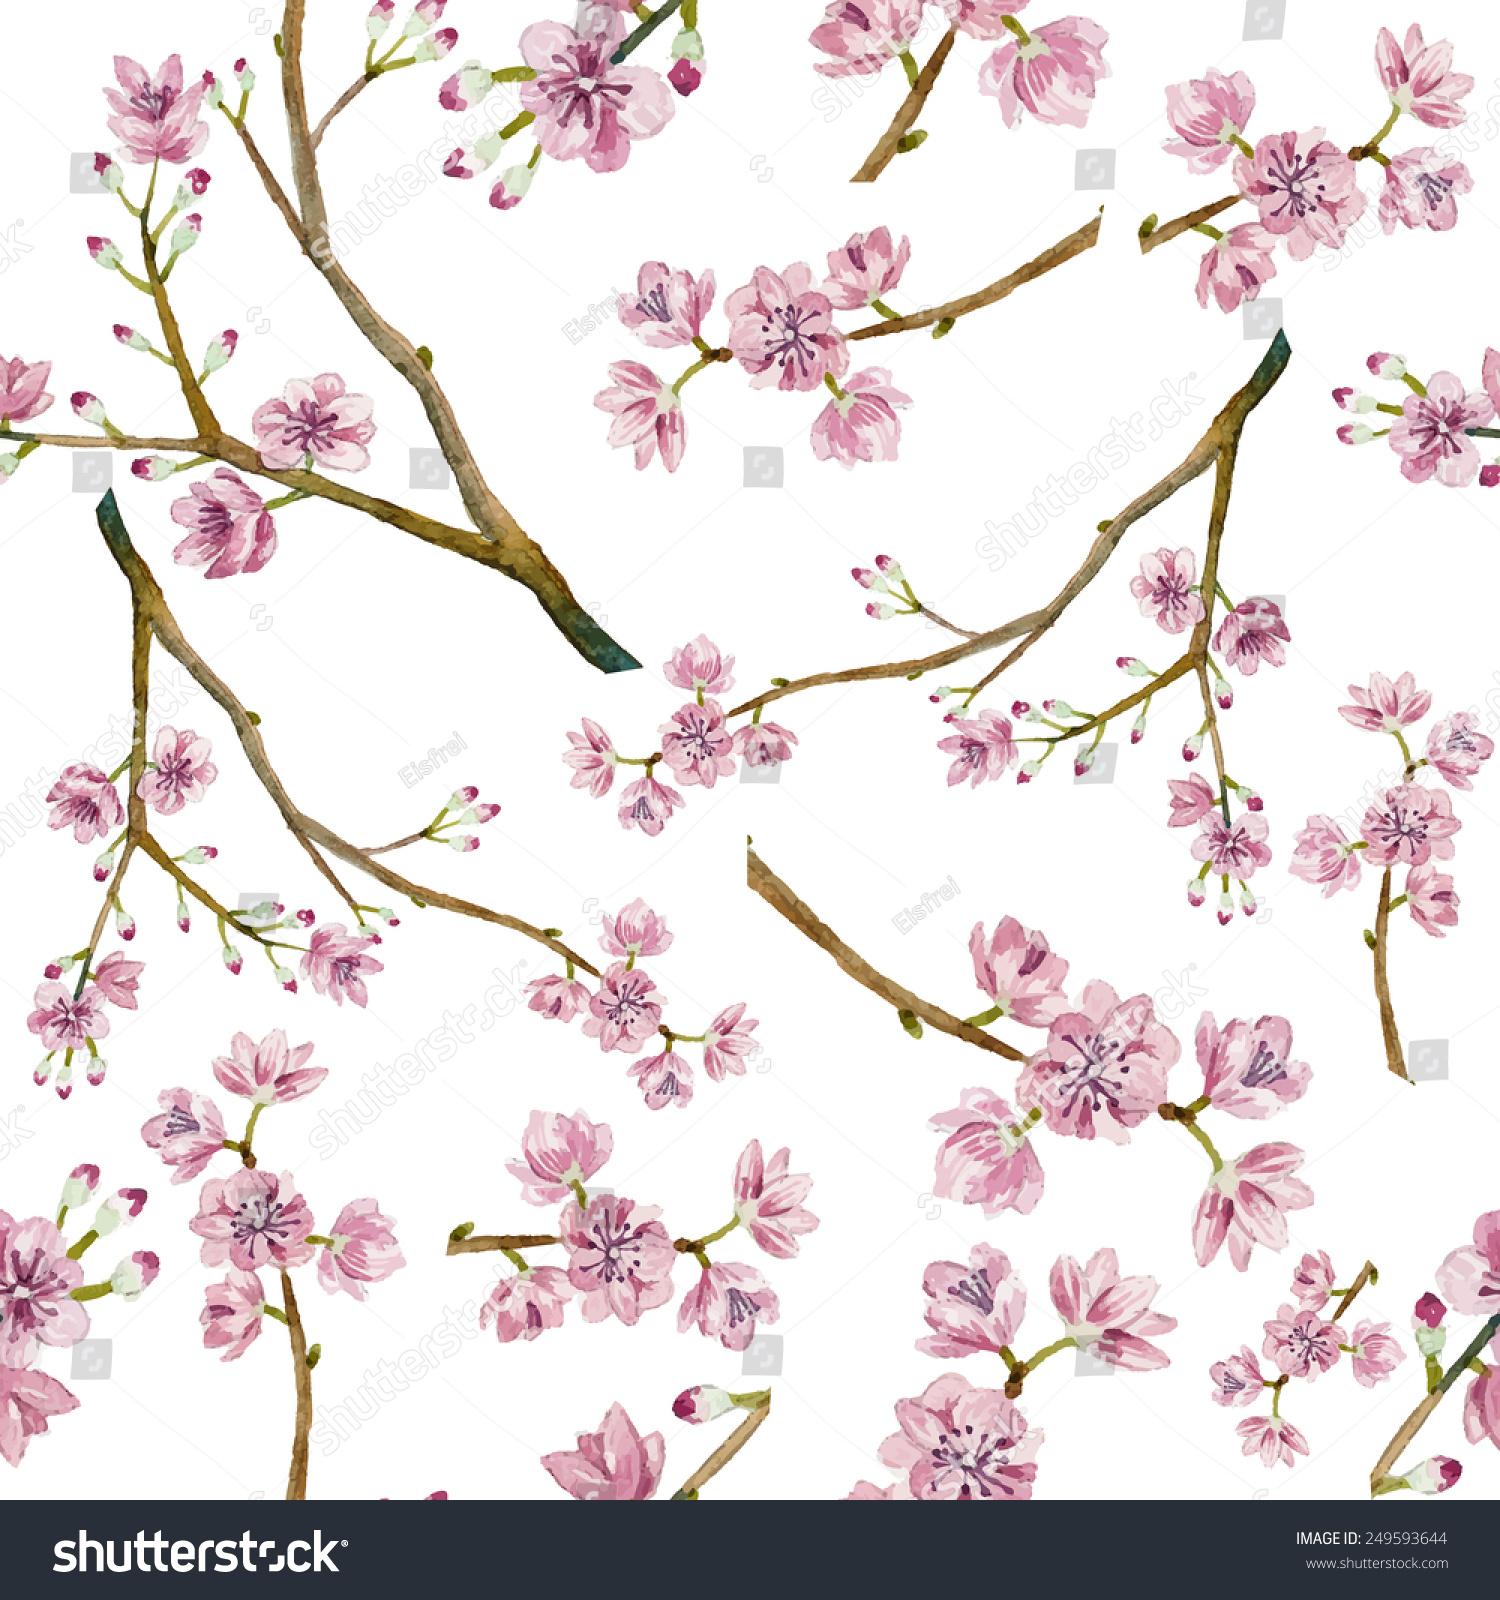 how to draw a cherry blossom tree dragoart